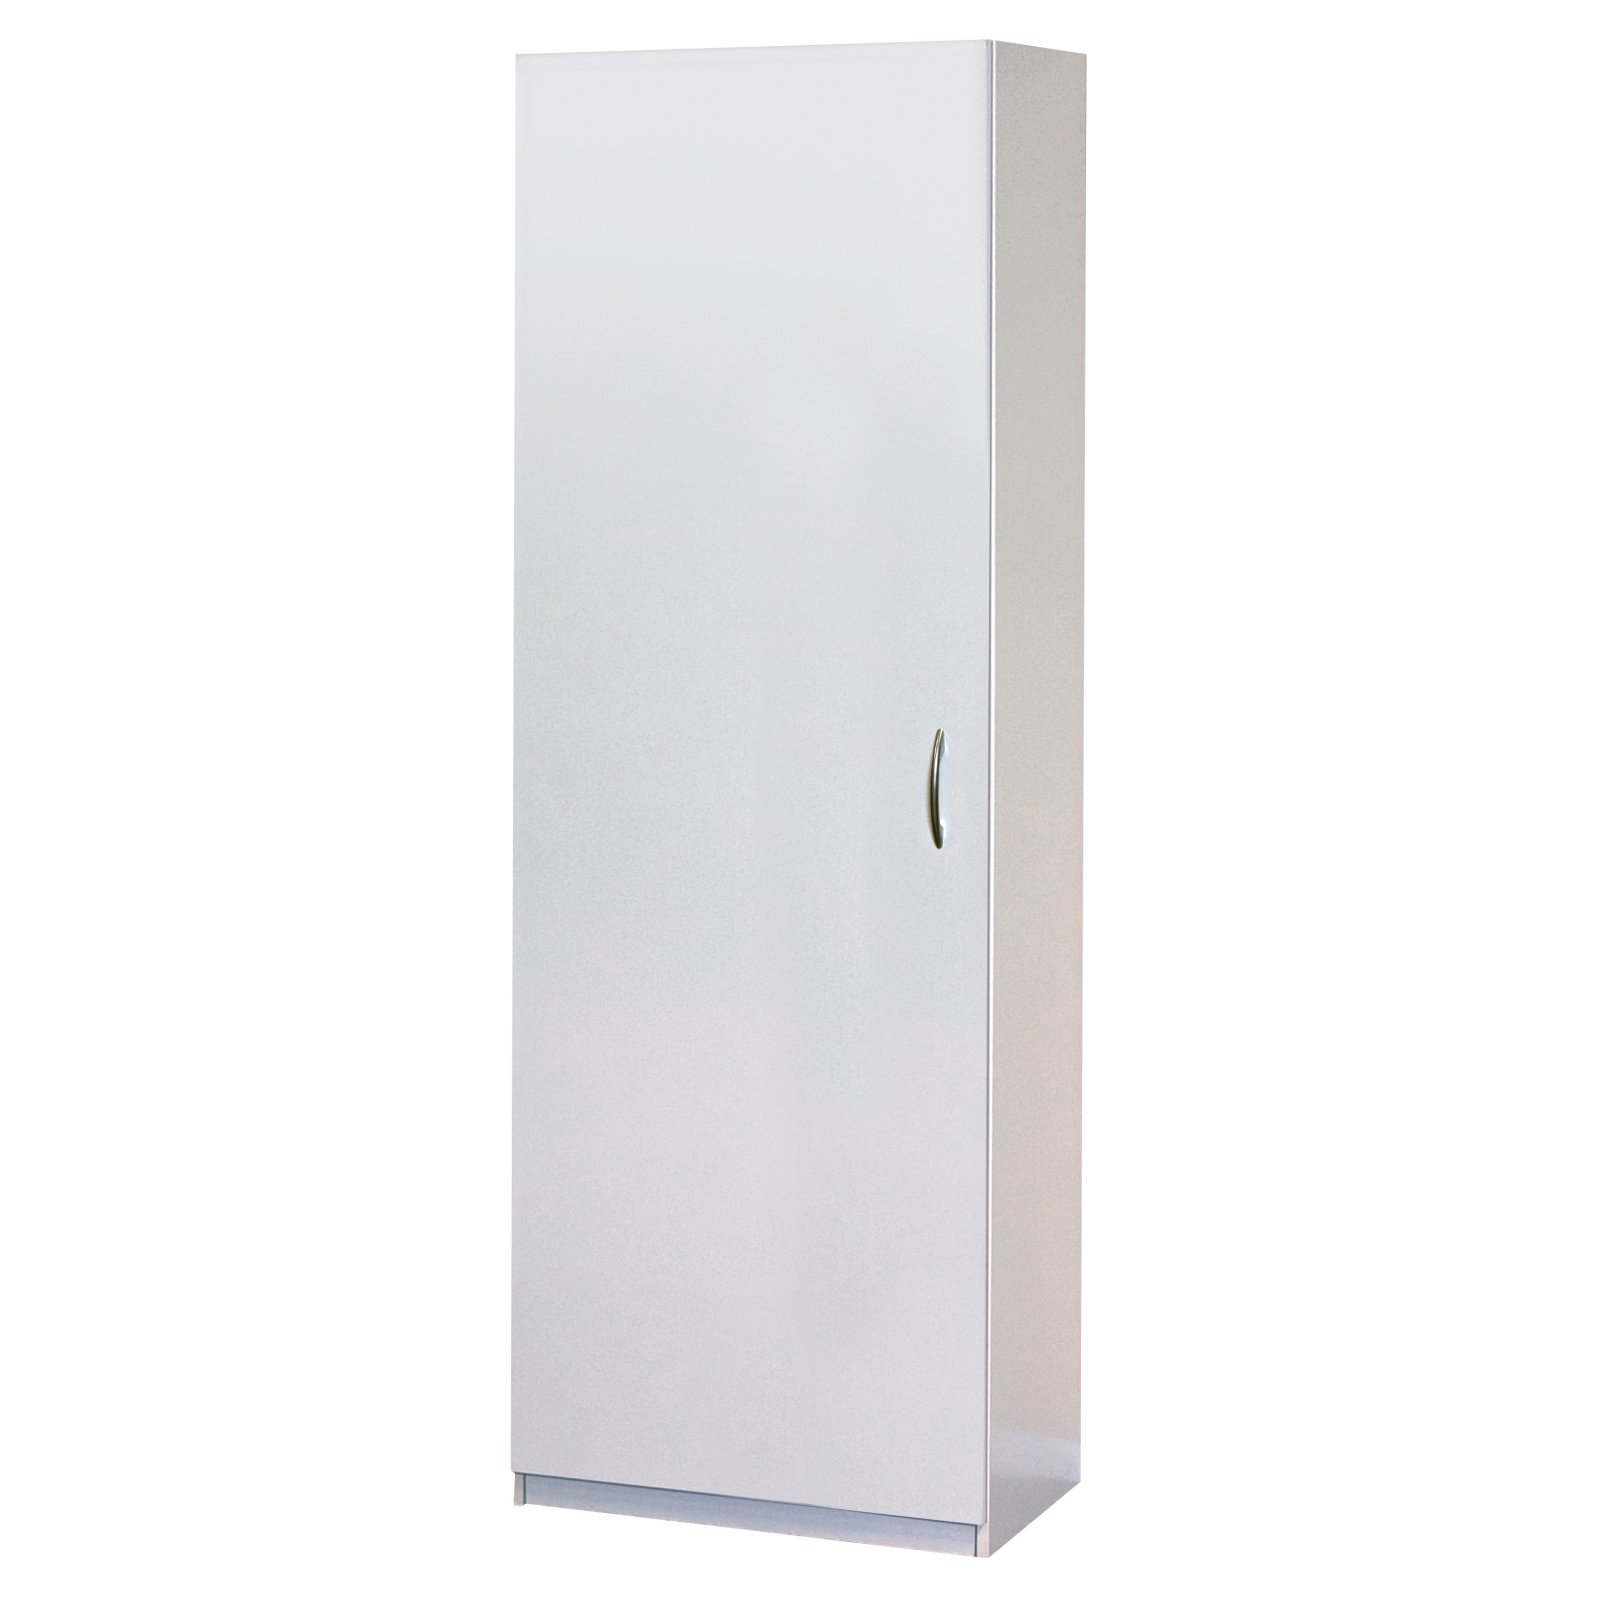 Upc 718793122815 Wood Closet Organizers Closetmaid